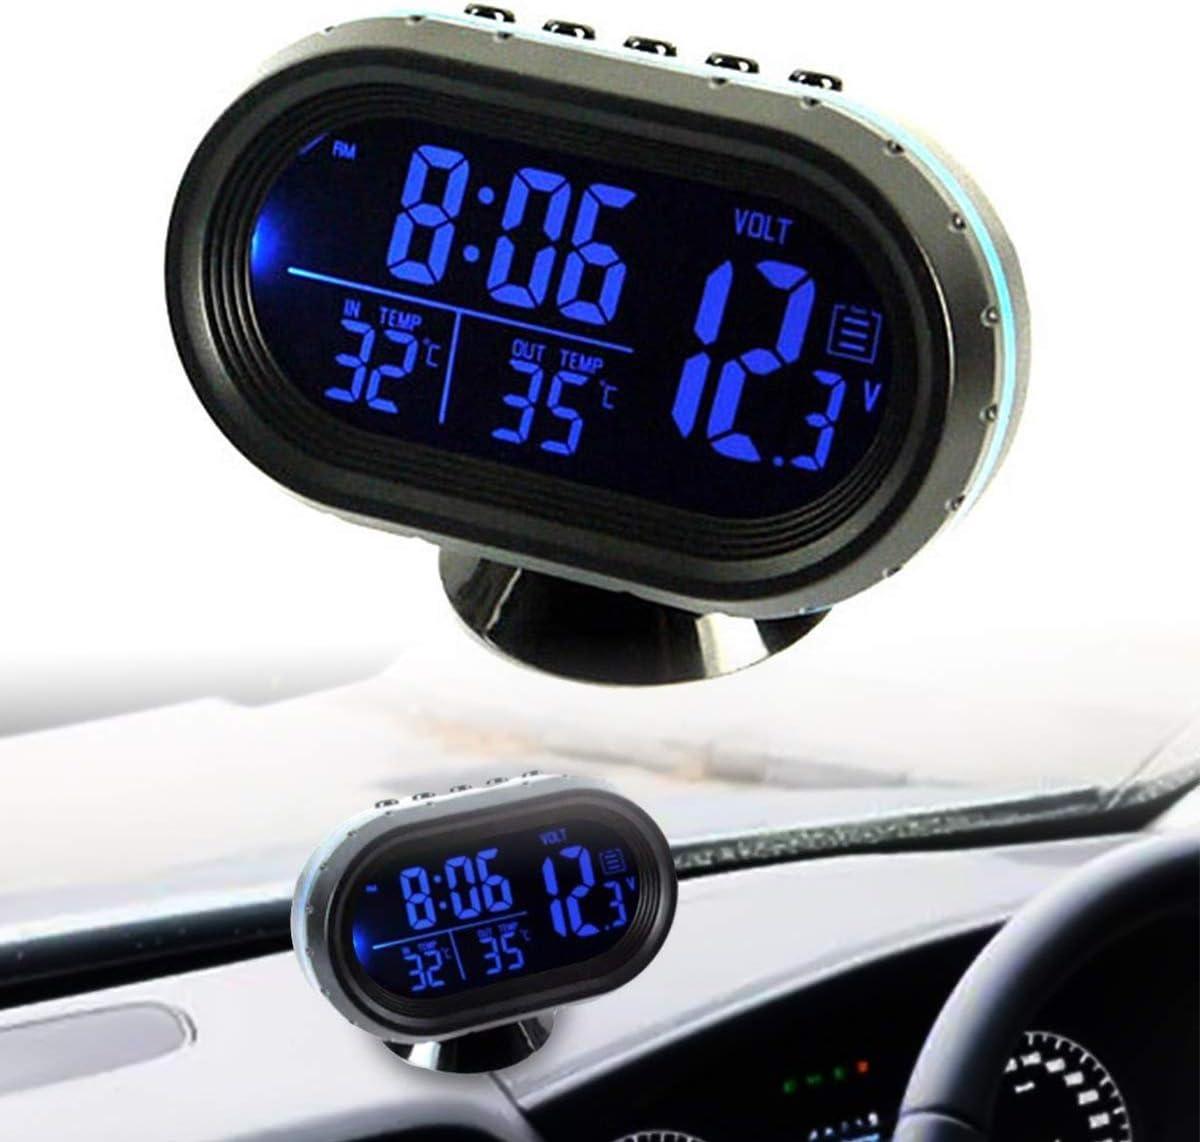 Riloer Termómetro para Coche Reloj Digital 12-24V Voltímetro Templado LCD Reloj Despertador con 2 Luces de Fondo (Azul/Rojo)